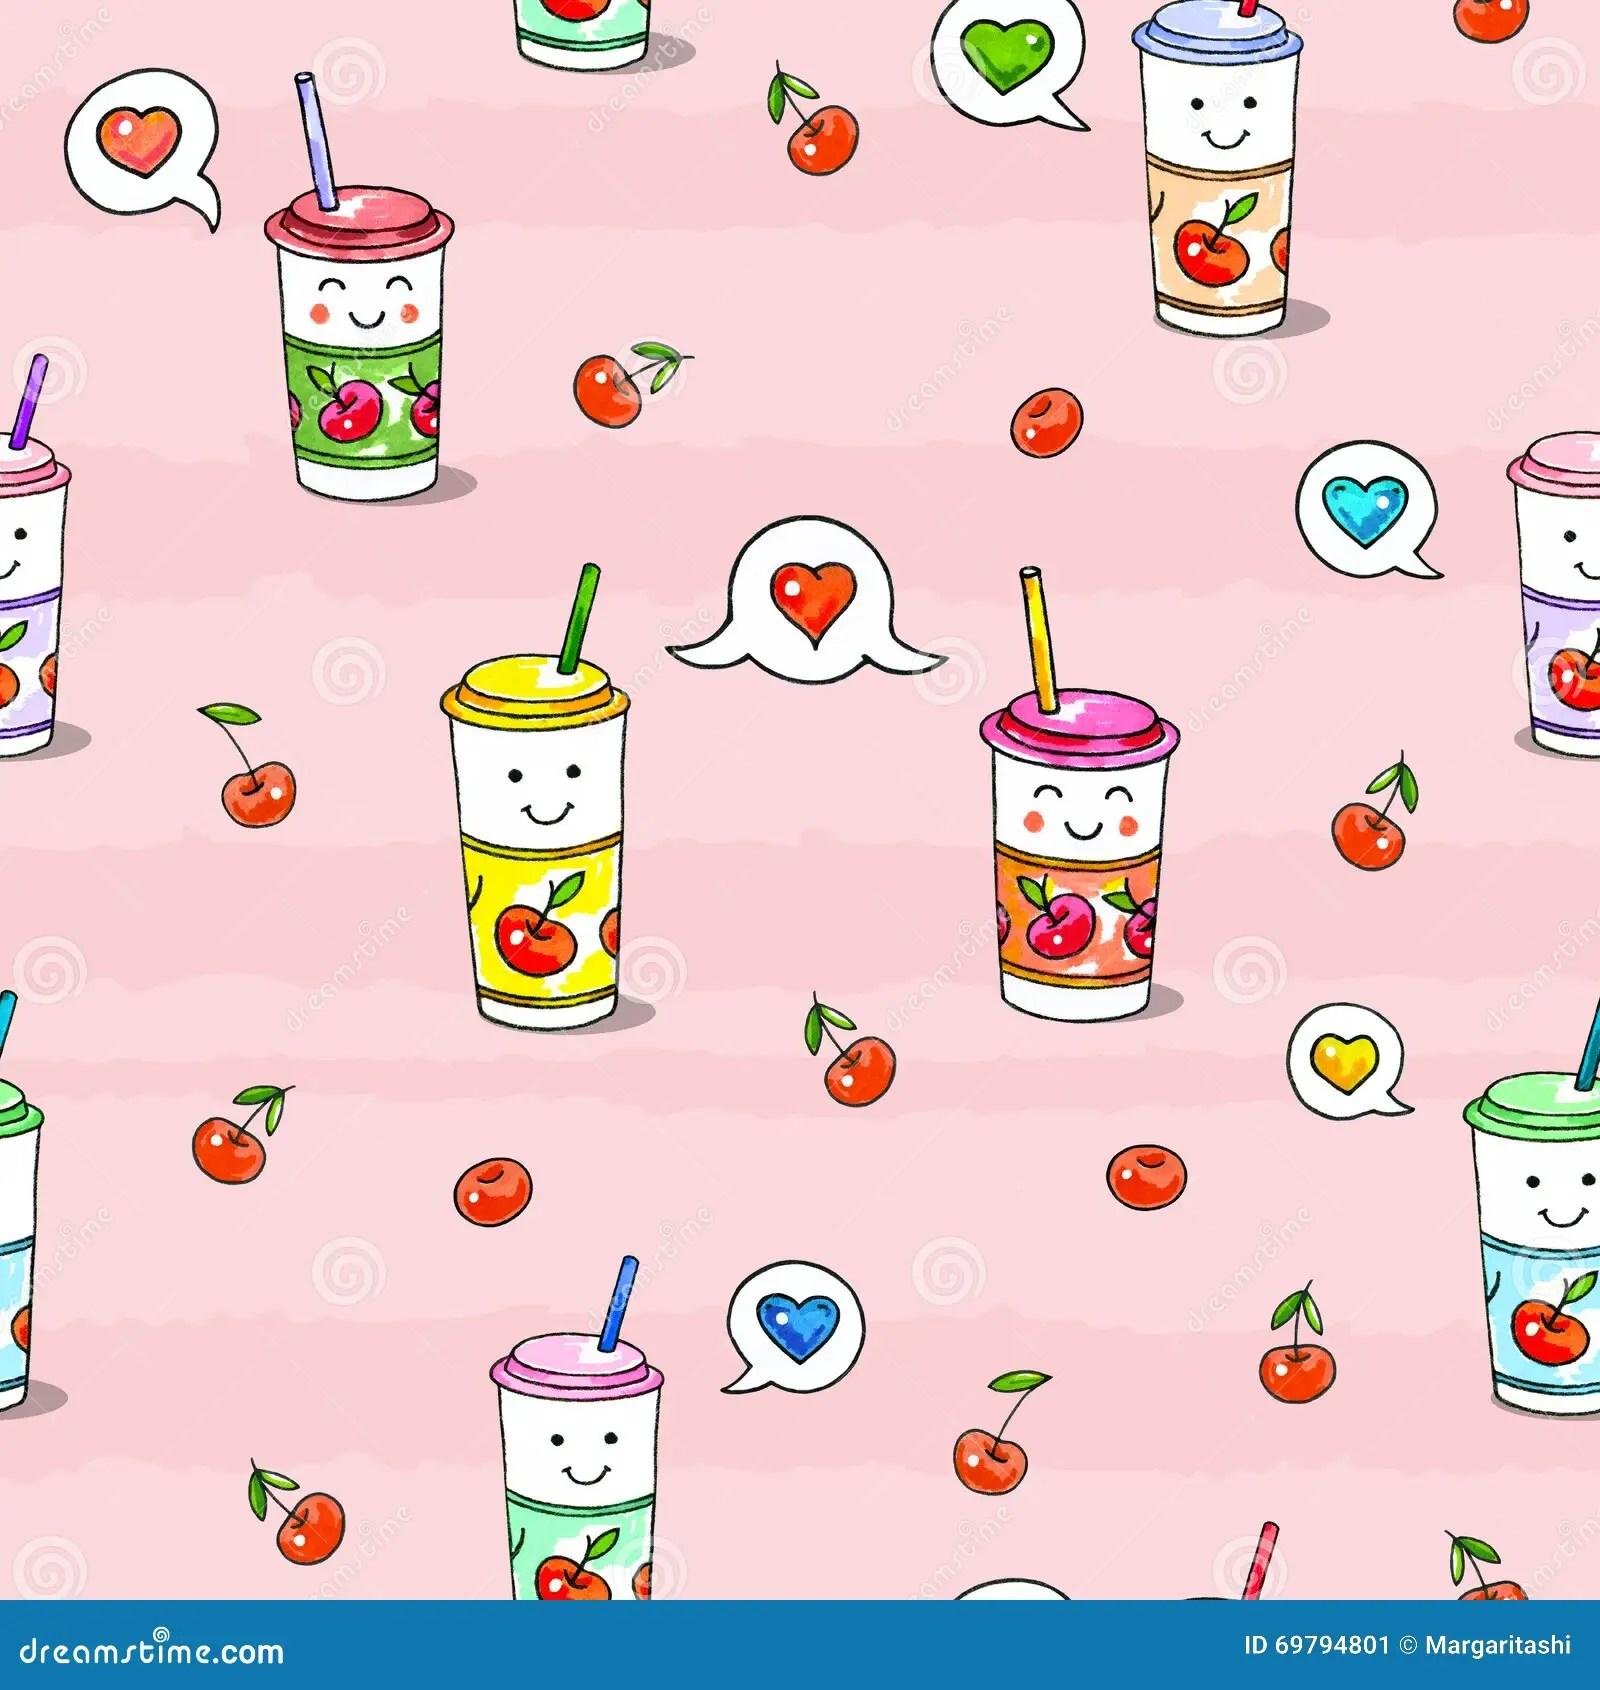 Cute Chinese Cartoon Wallpaper Nourriture De Kawaii Sur Le Fond Rose Dessin De Caract 232 Res